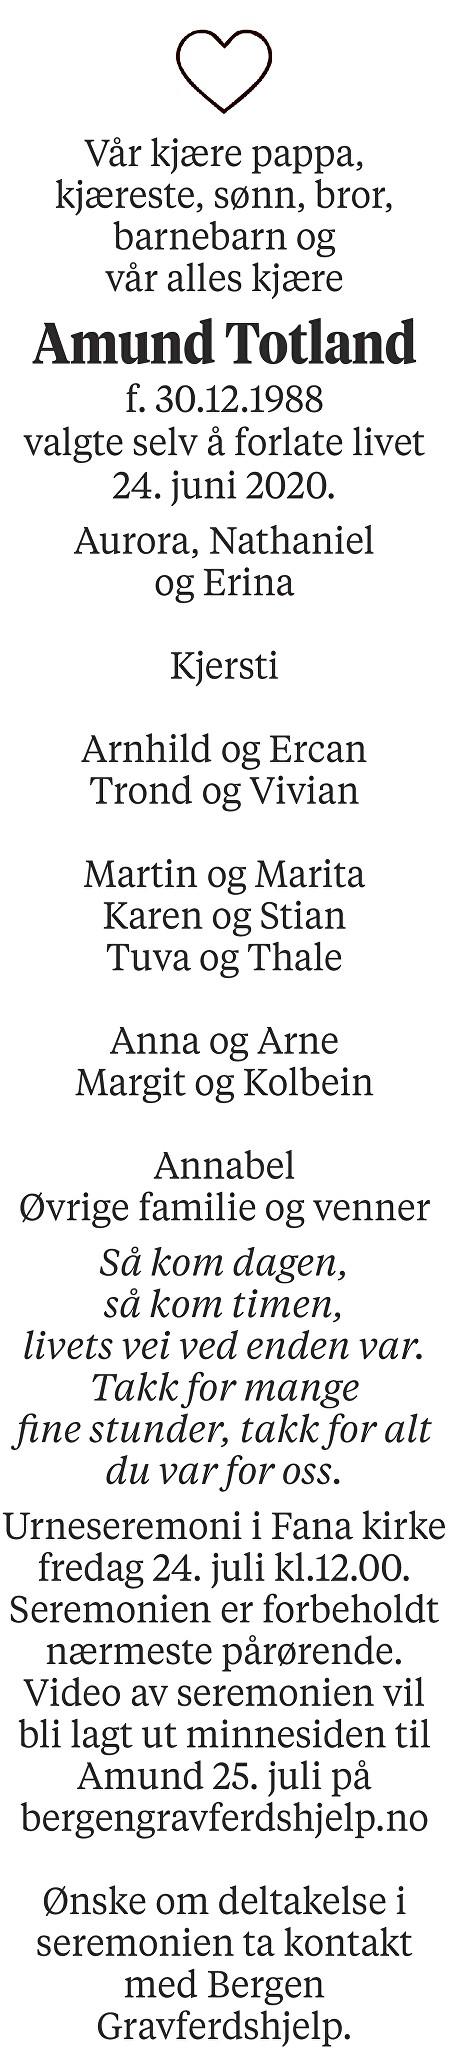 Amund Totland Dødsannonse